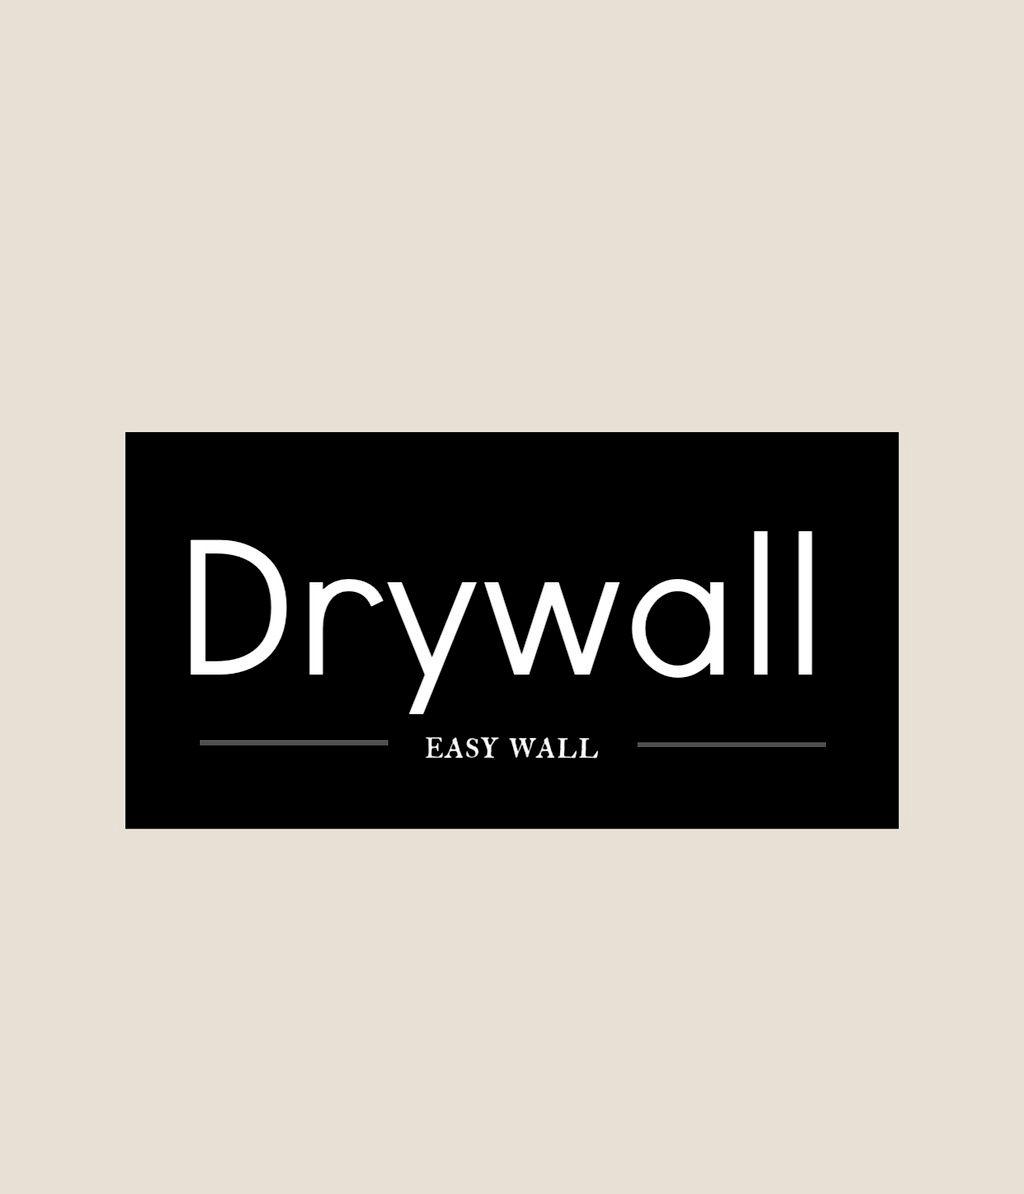 IVA DRYWALL & CEILING